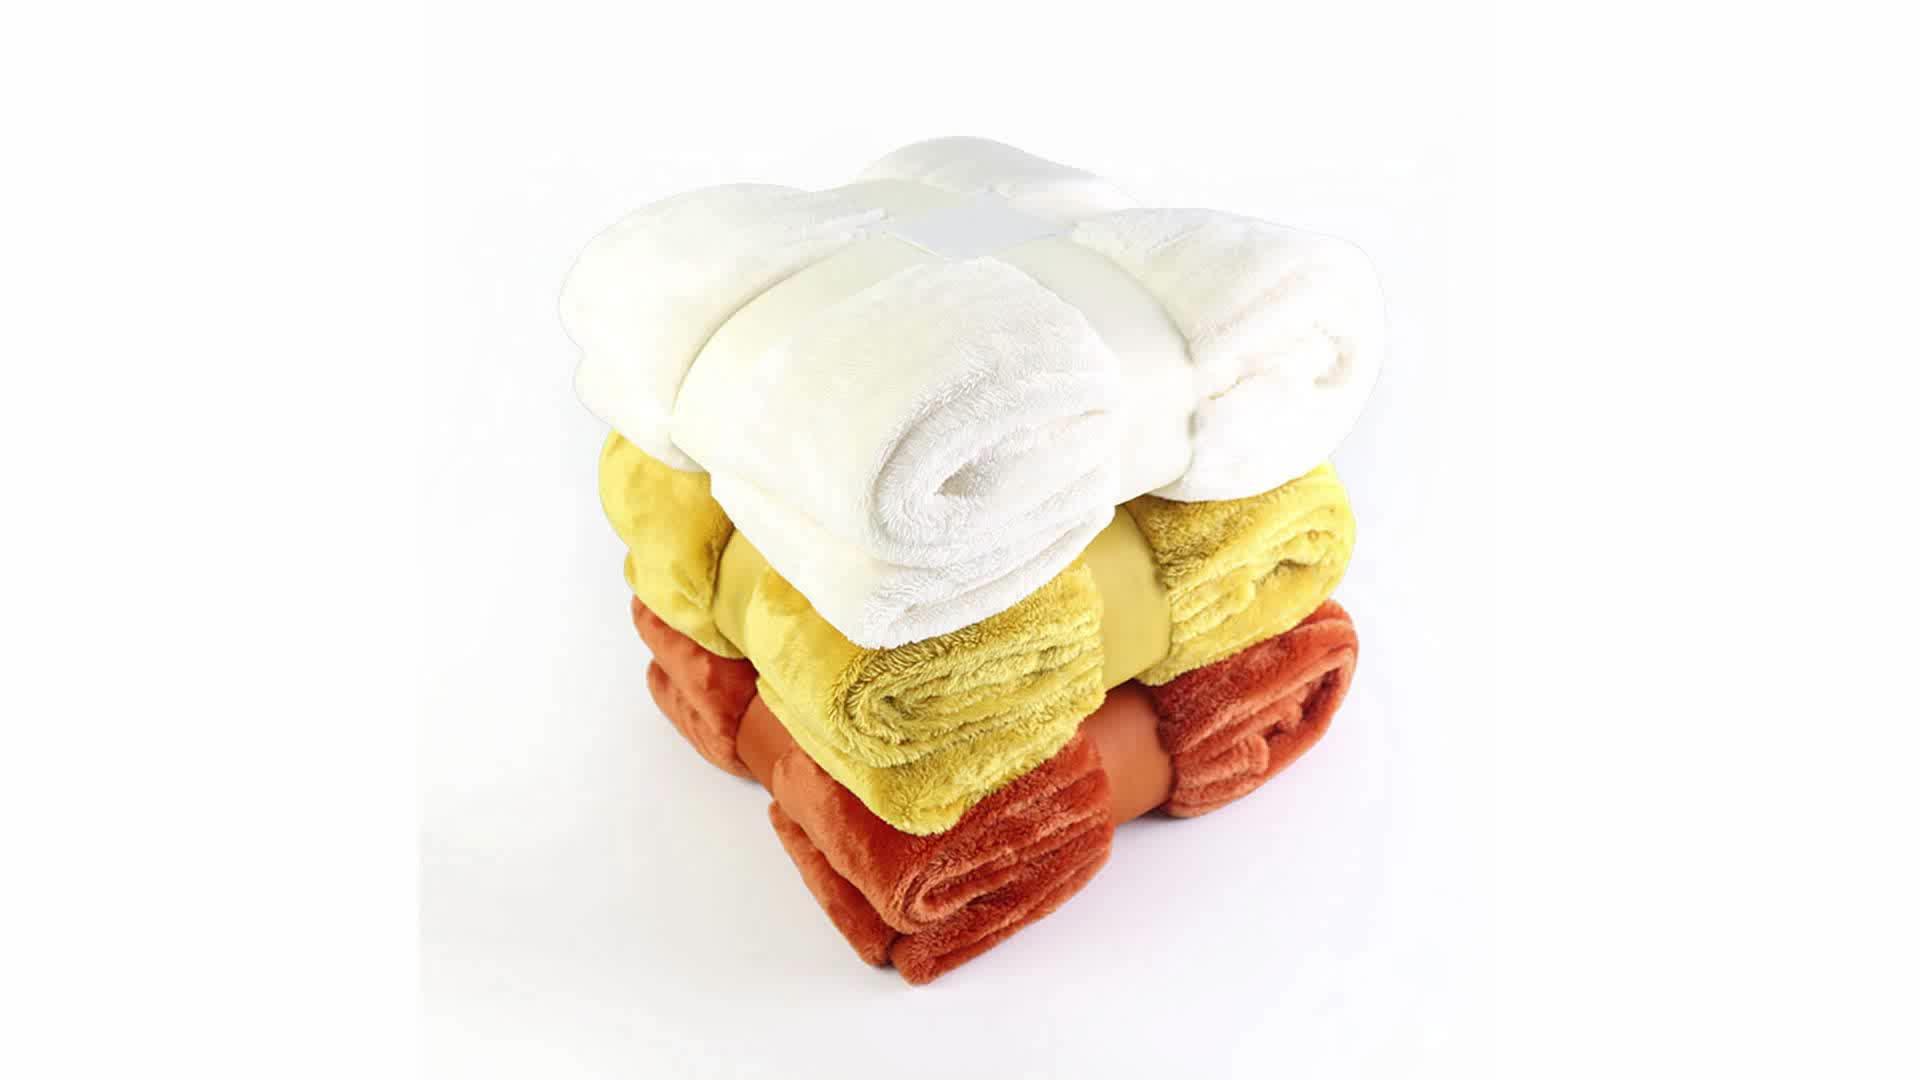 Super Lembut Poliester 100% Plush Fuzzy Sofa Ranjang Polos Flanel Fleece Selimut